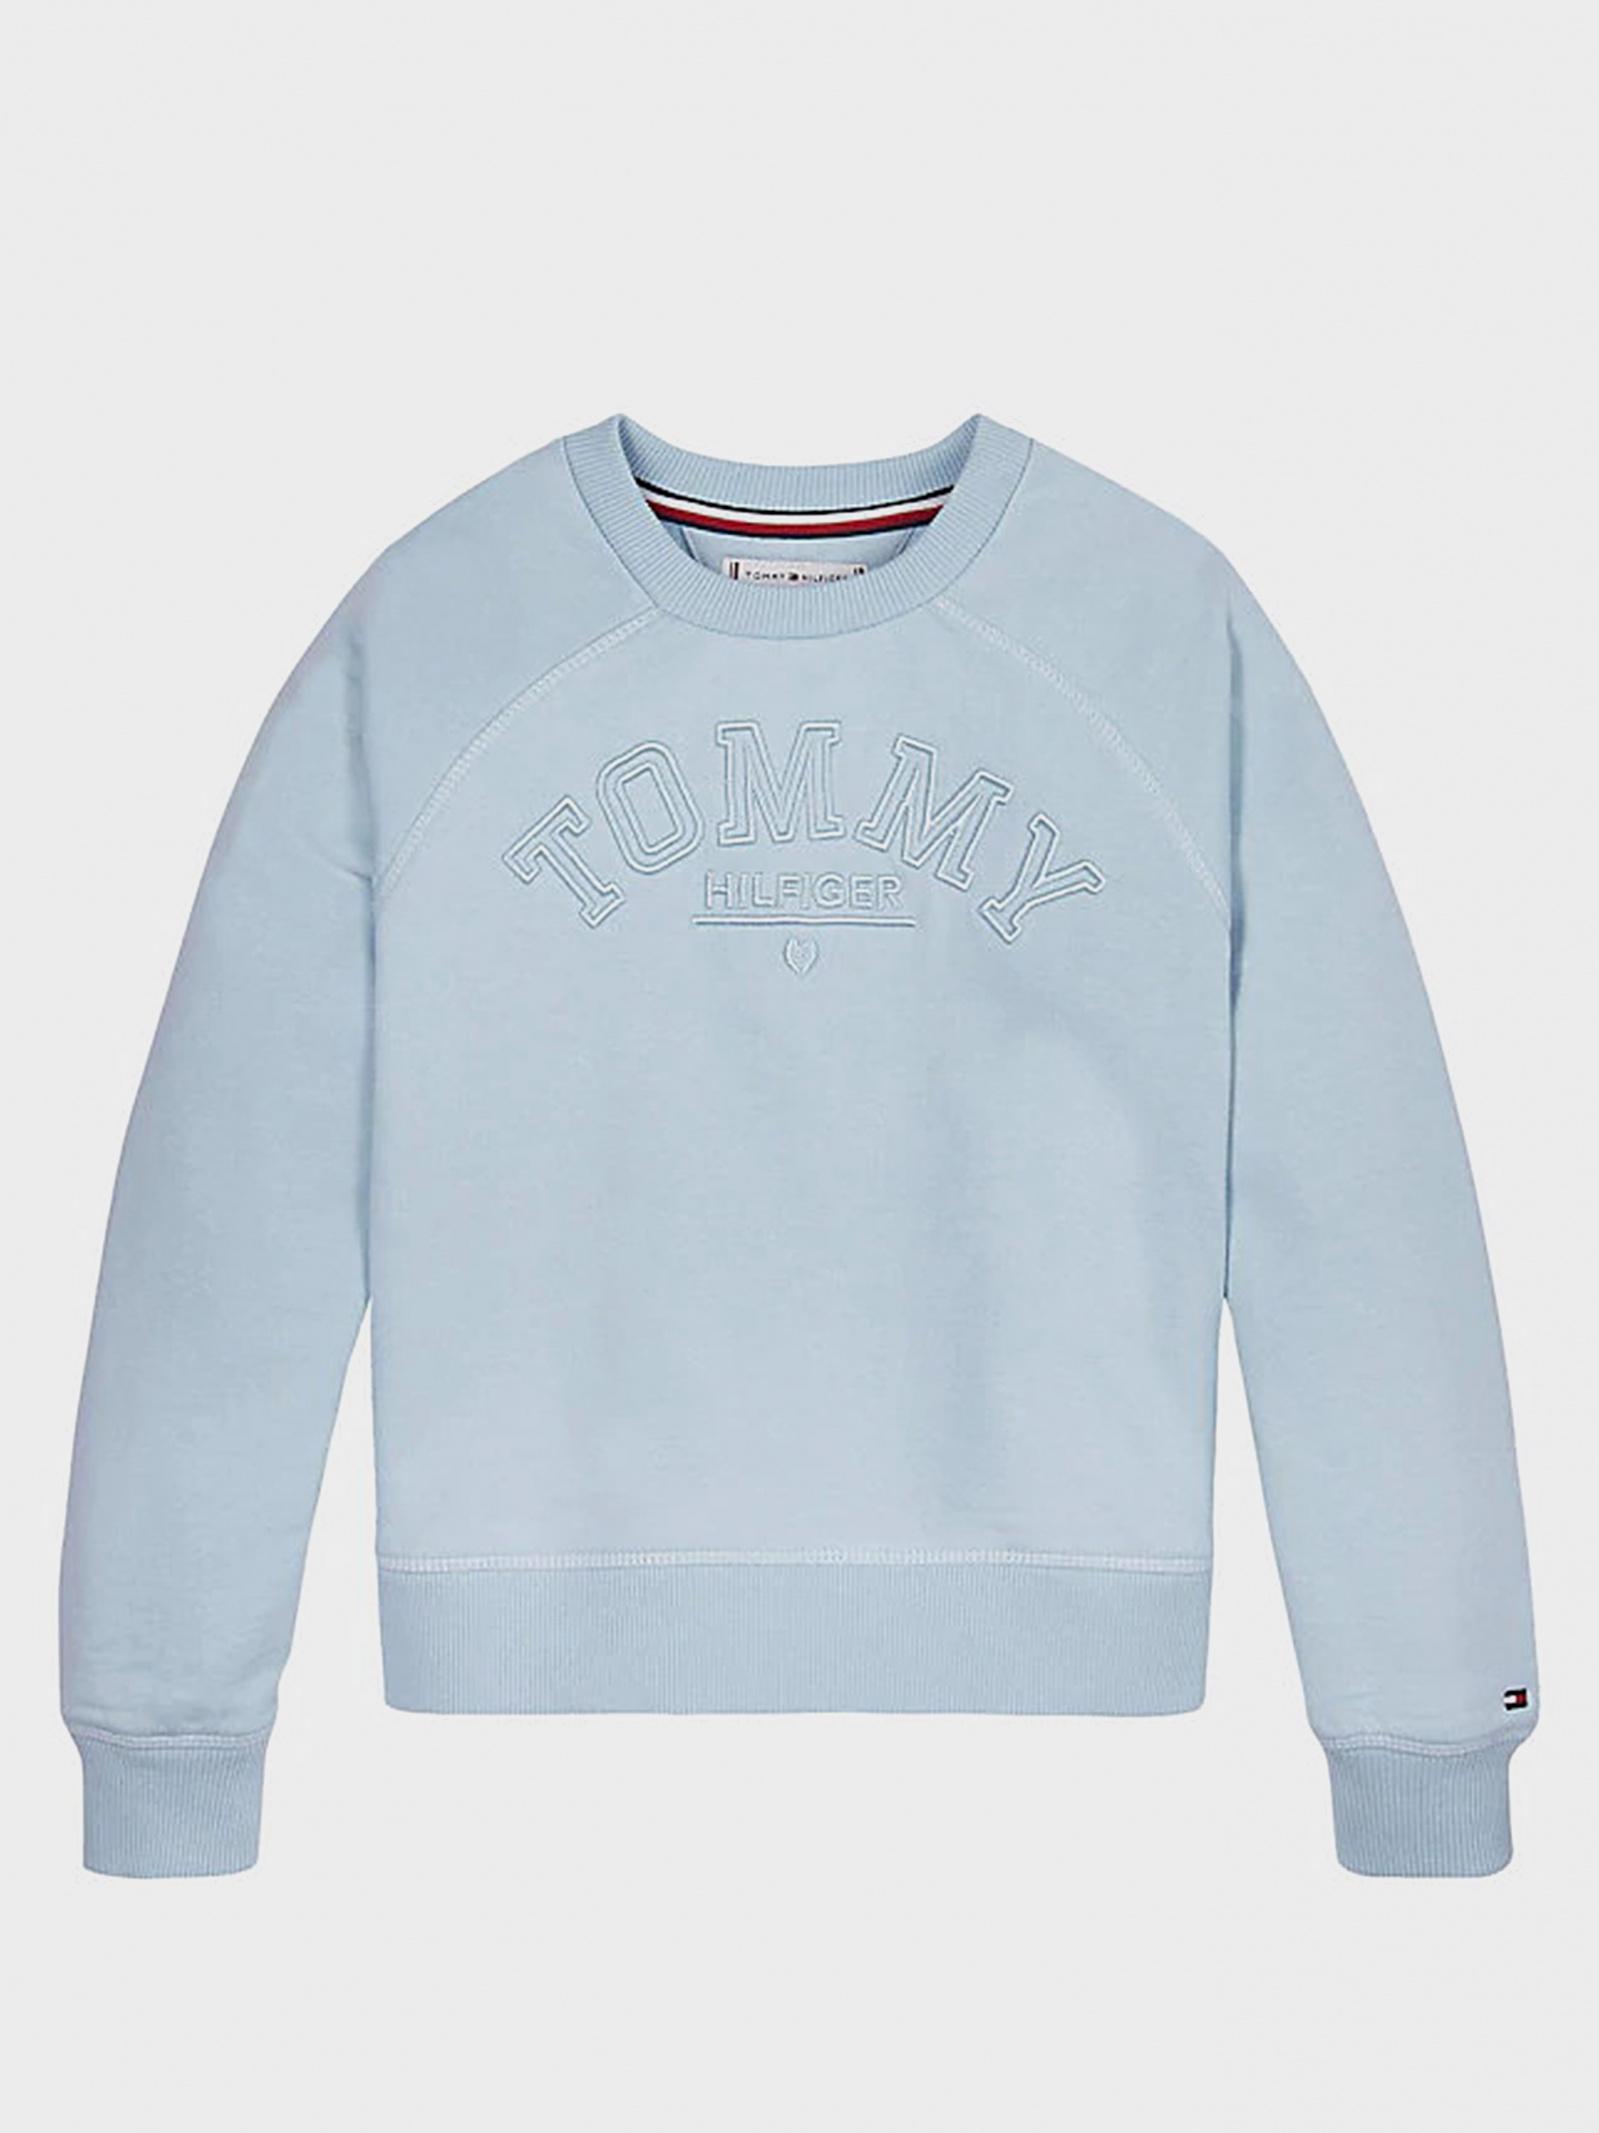 Tommy Hilfiger Кофти та светри дитячі модель KG0KG05167-C1S купити, 2017